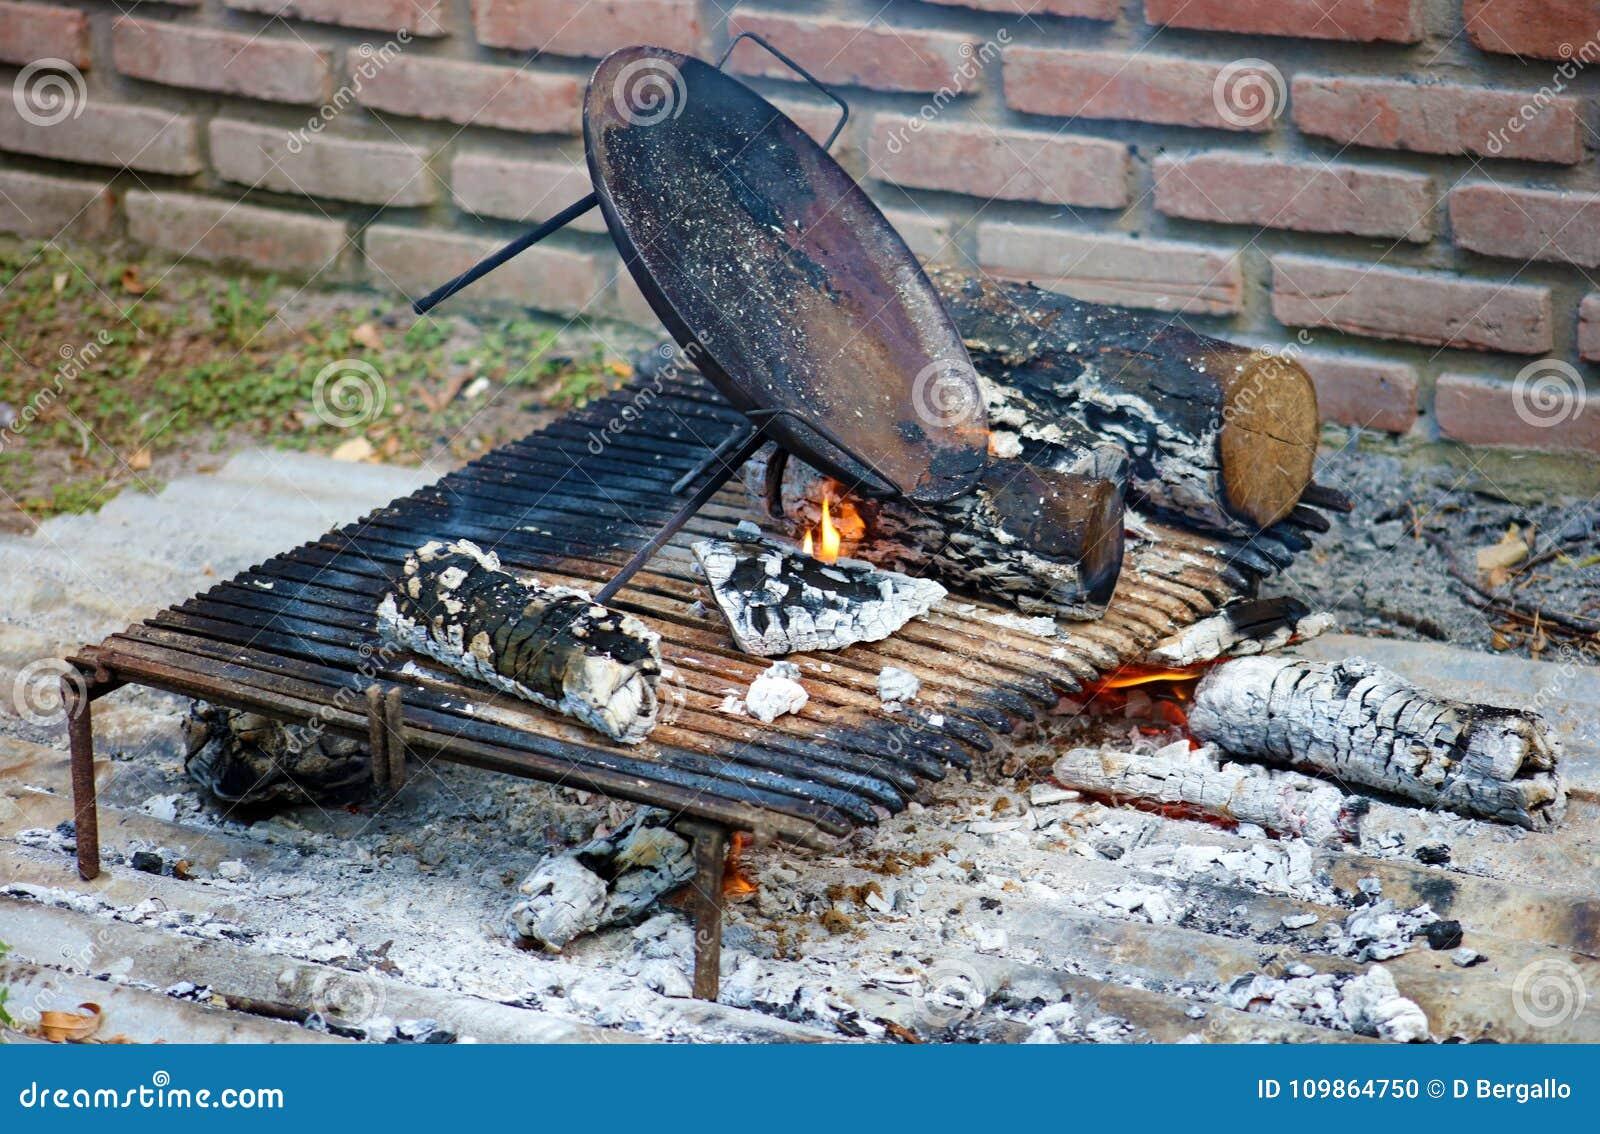 barbecue argentin traditionnel d 39 asado de bbq de tradition de l 39 argentine du br sil argentin. Black Bedroom Furniture Sets. Home Design Ideas